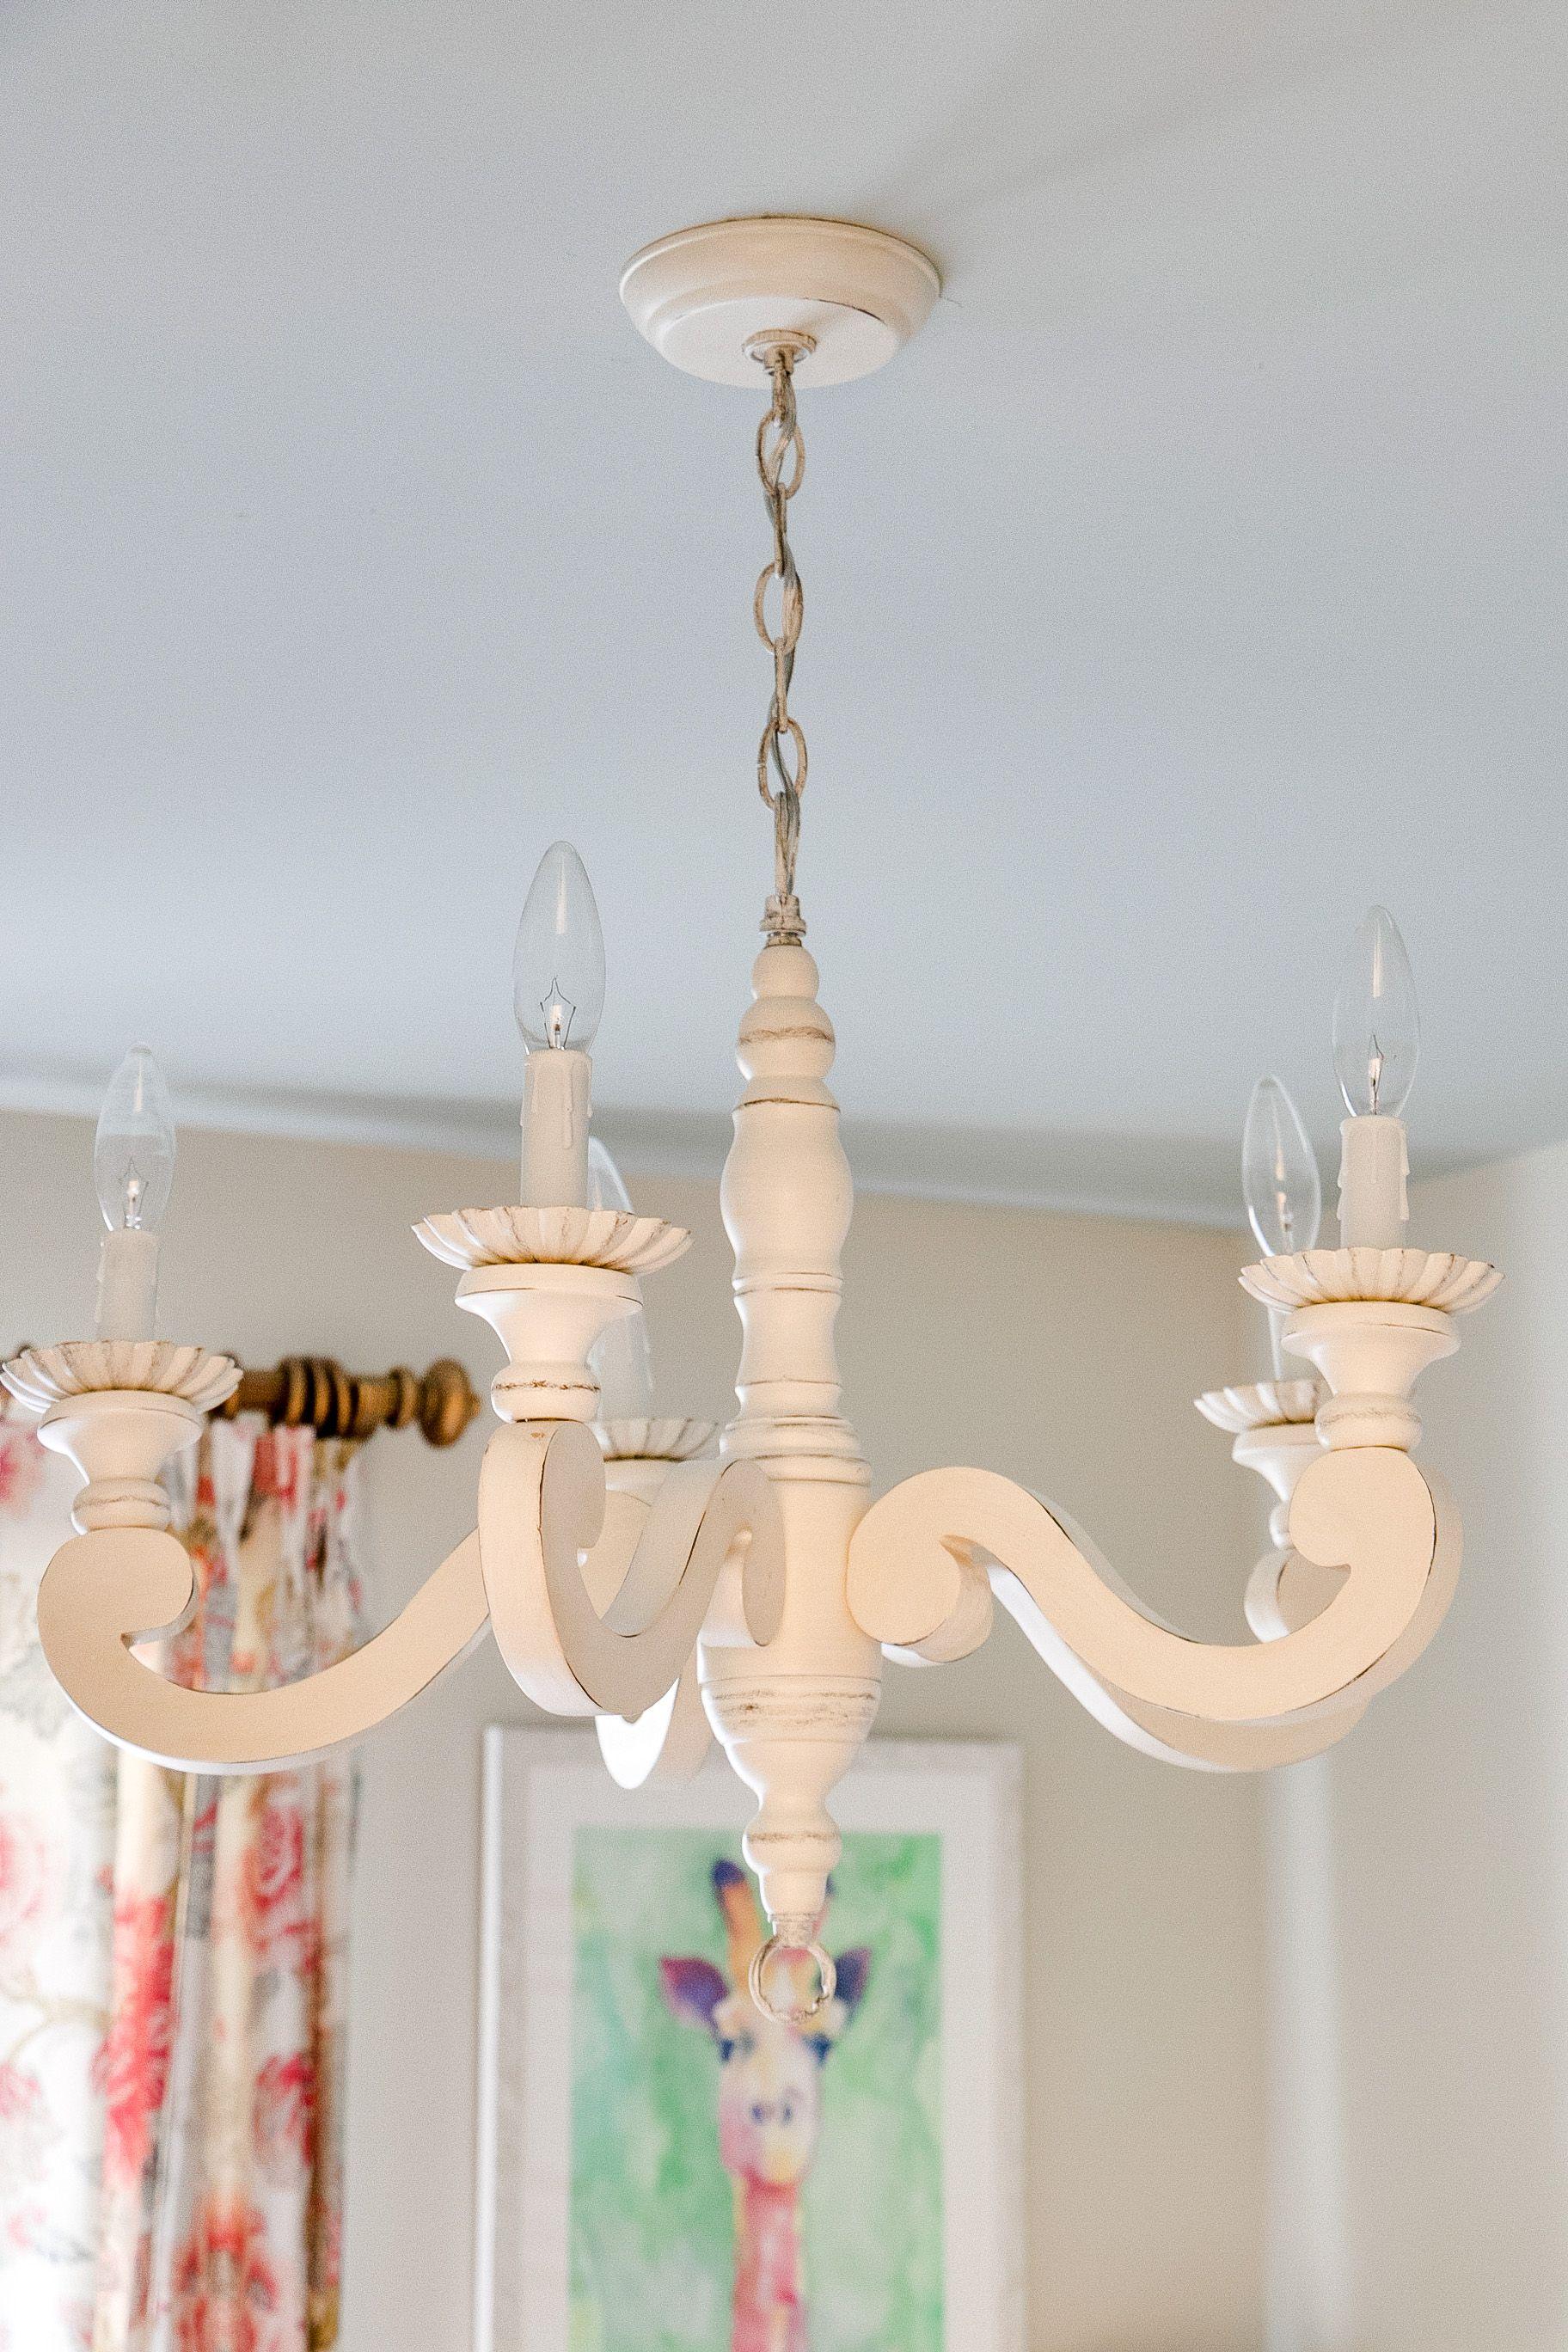 chandelier nursery lightfixture Ceiling lights